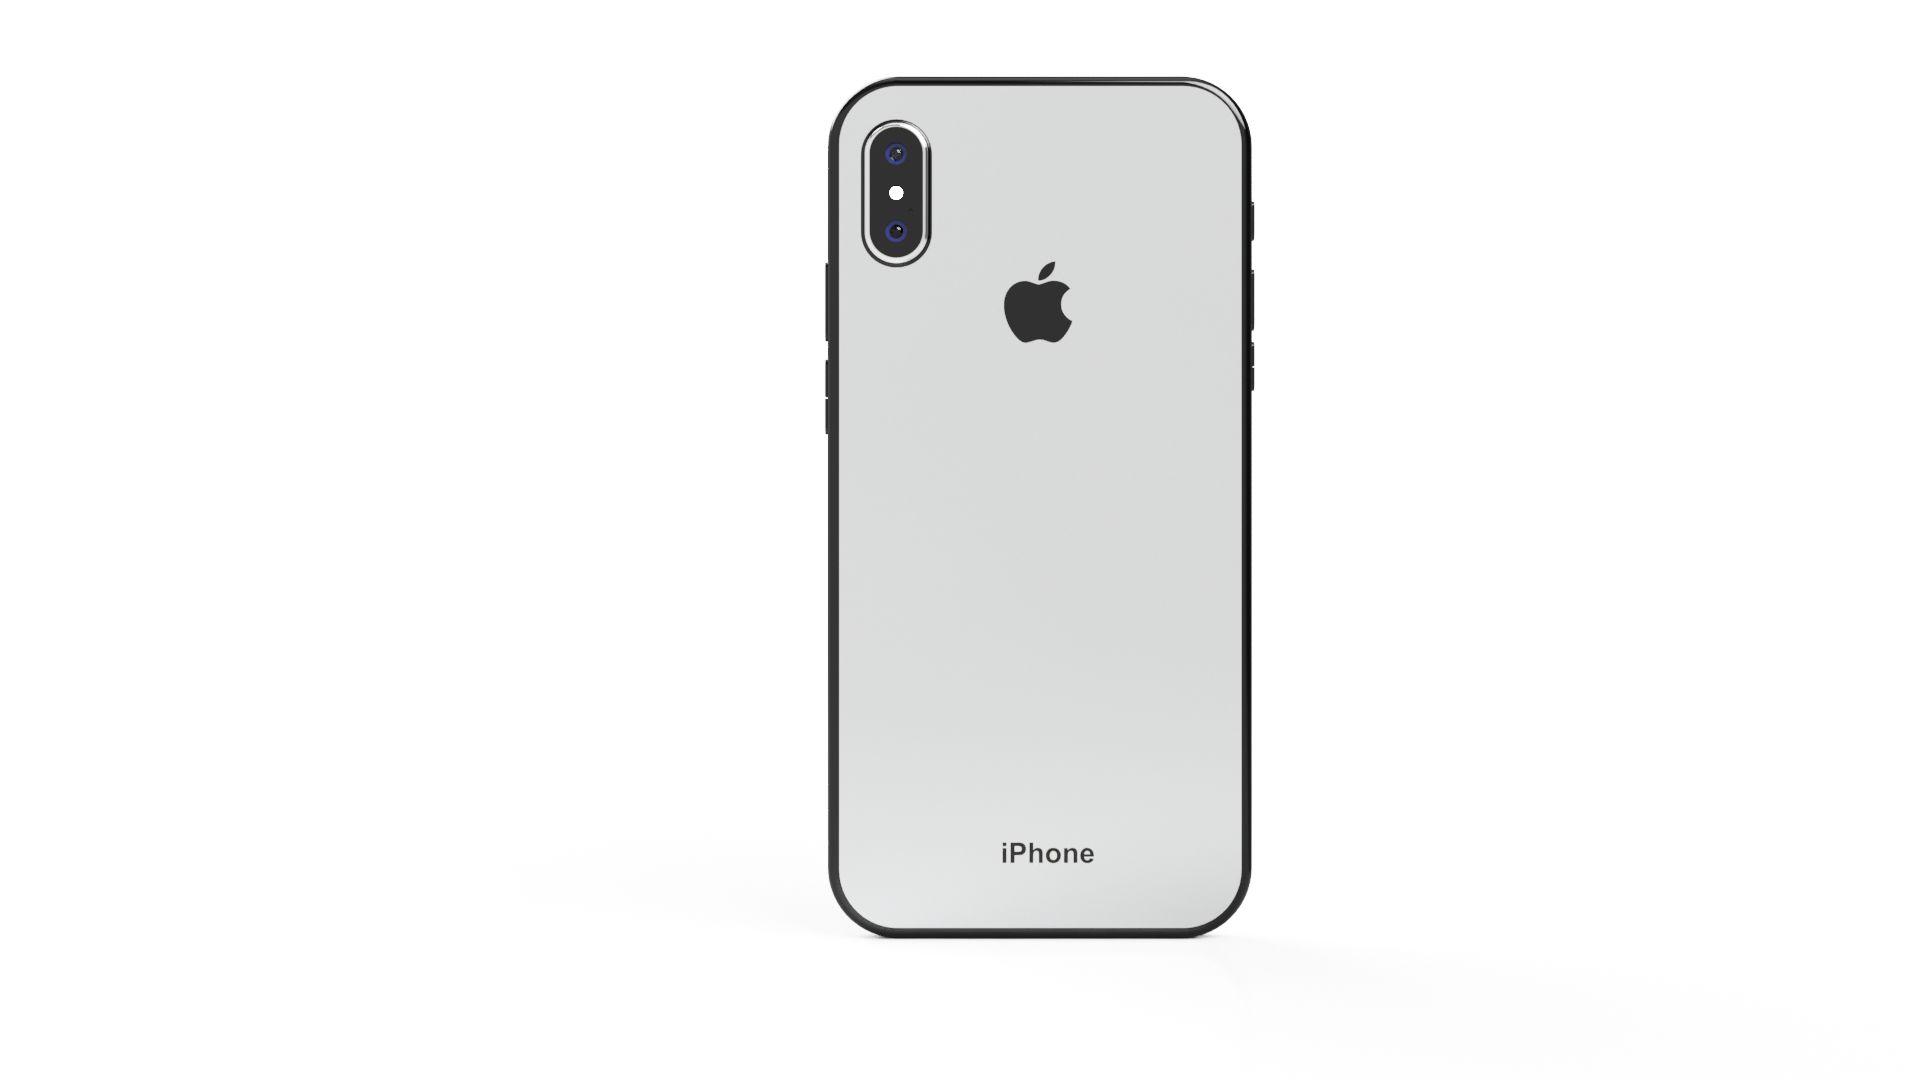 Iphone-4-3500-3500